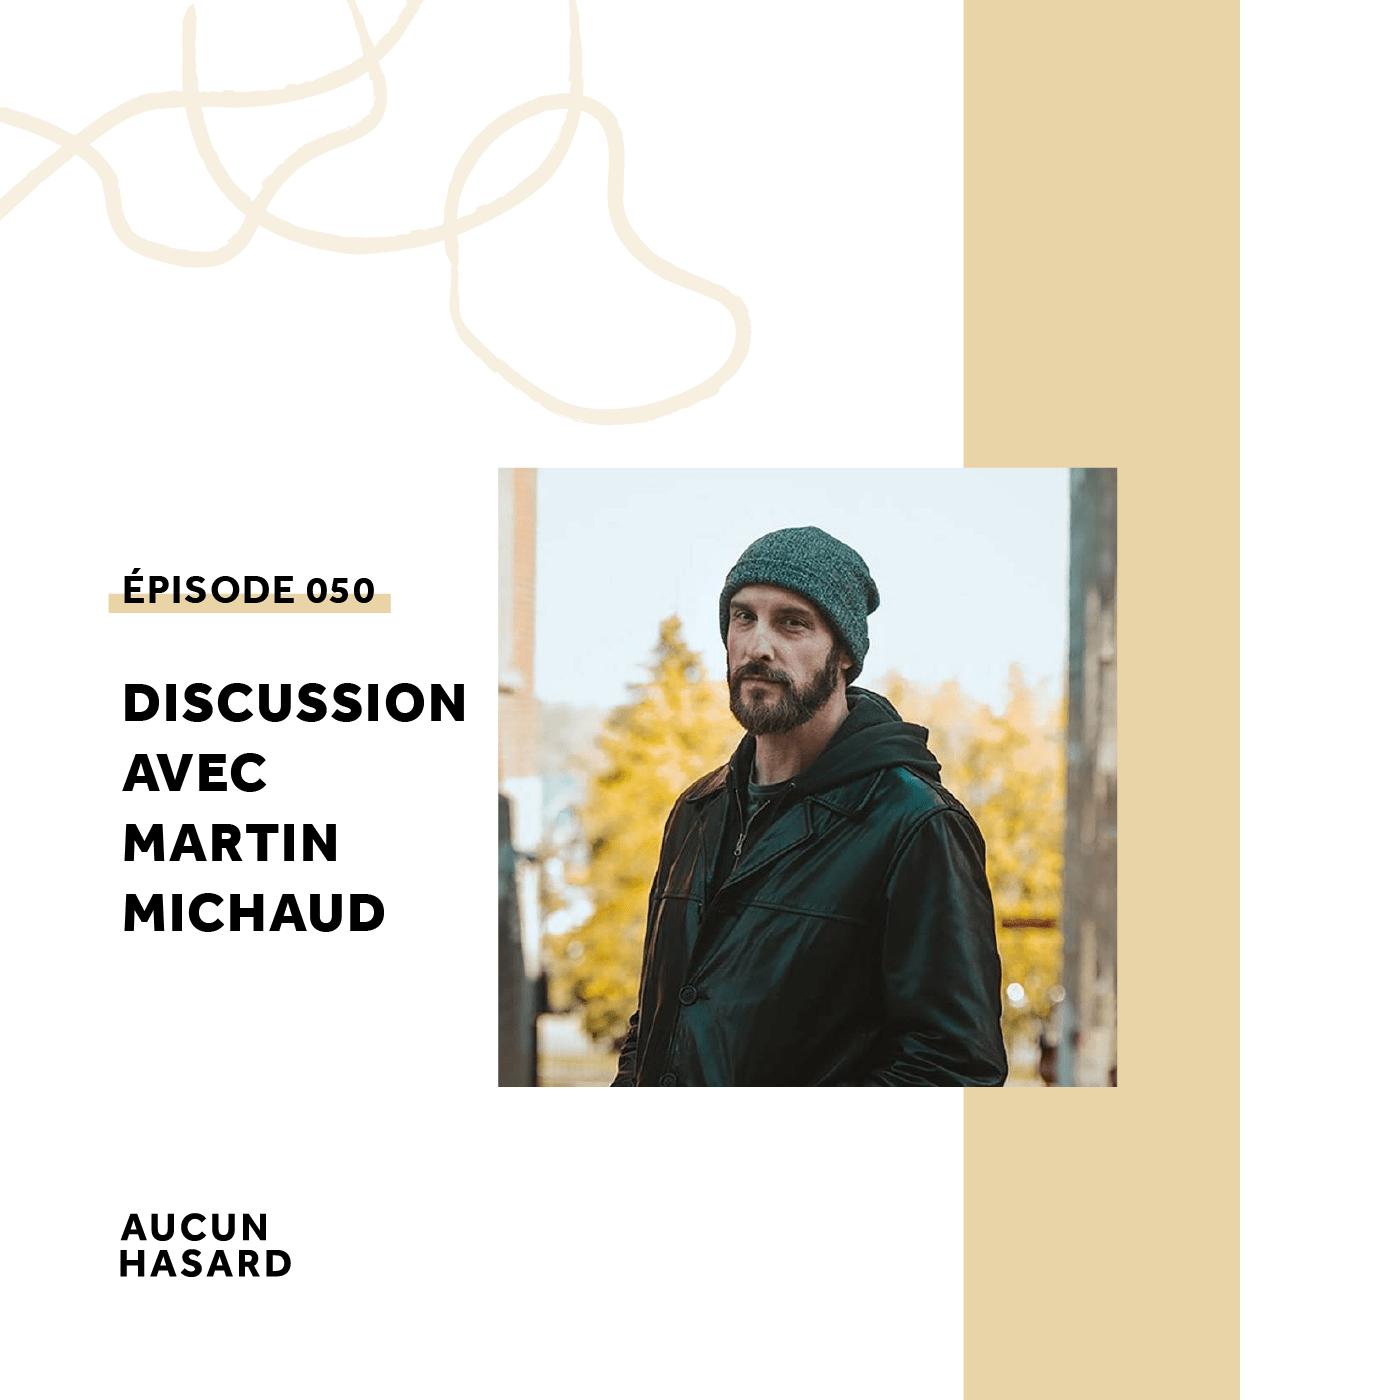 050 – Discussion avec Martin Michaud